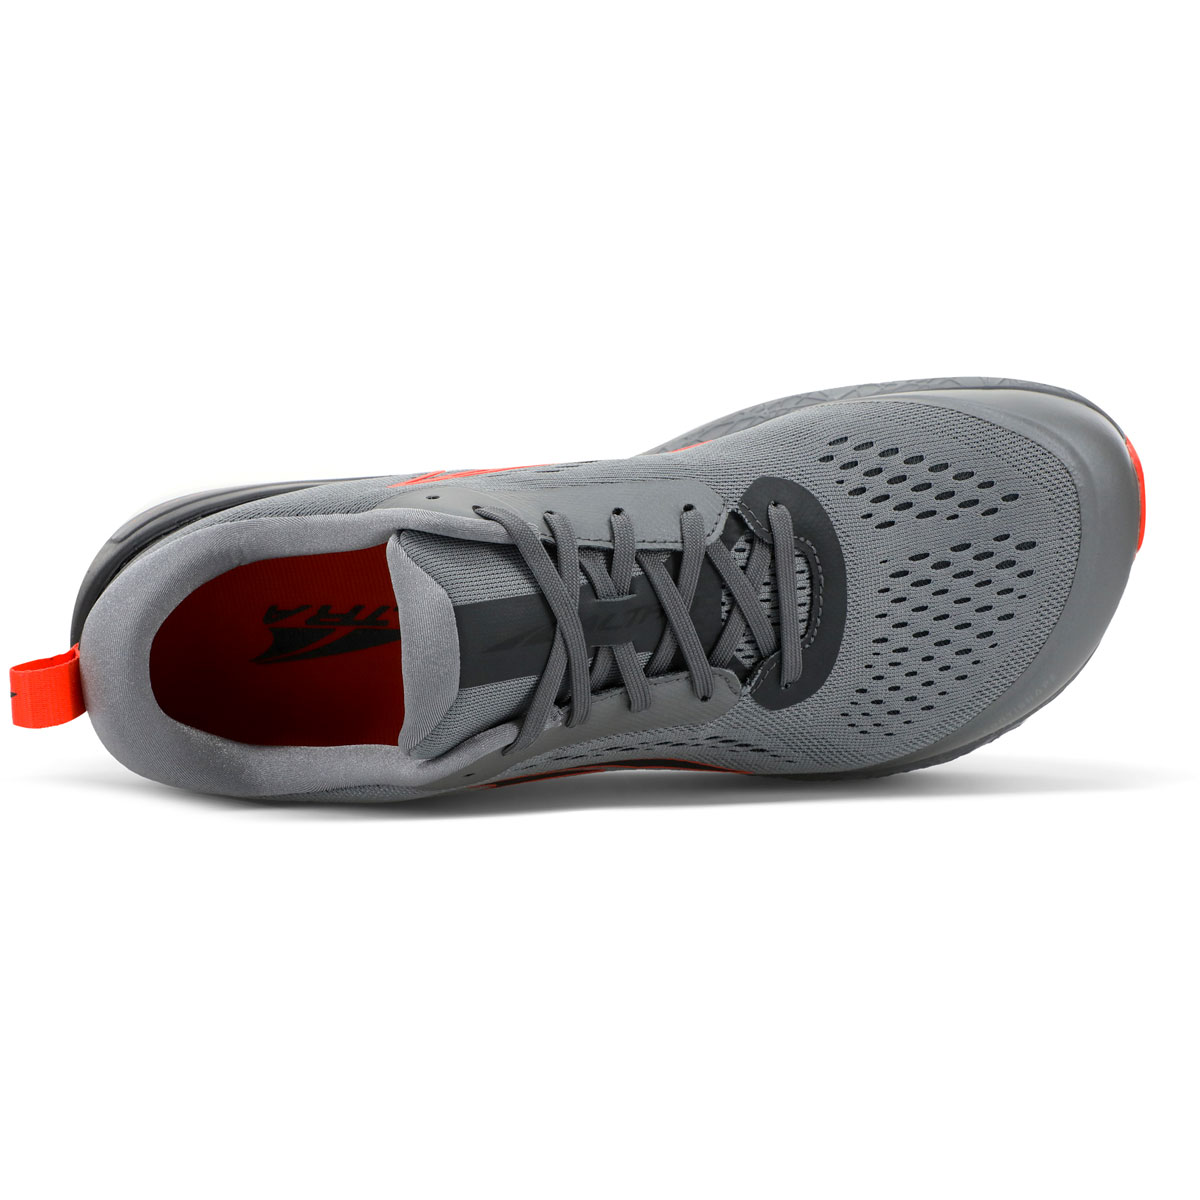 Men's Altra Paradigm 5 Running Shoe - Color: Gray/Orange - Size: 9.5 - Width: Regular, Gray/Orange, large, image 3